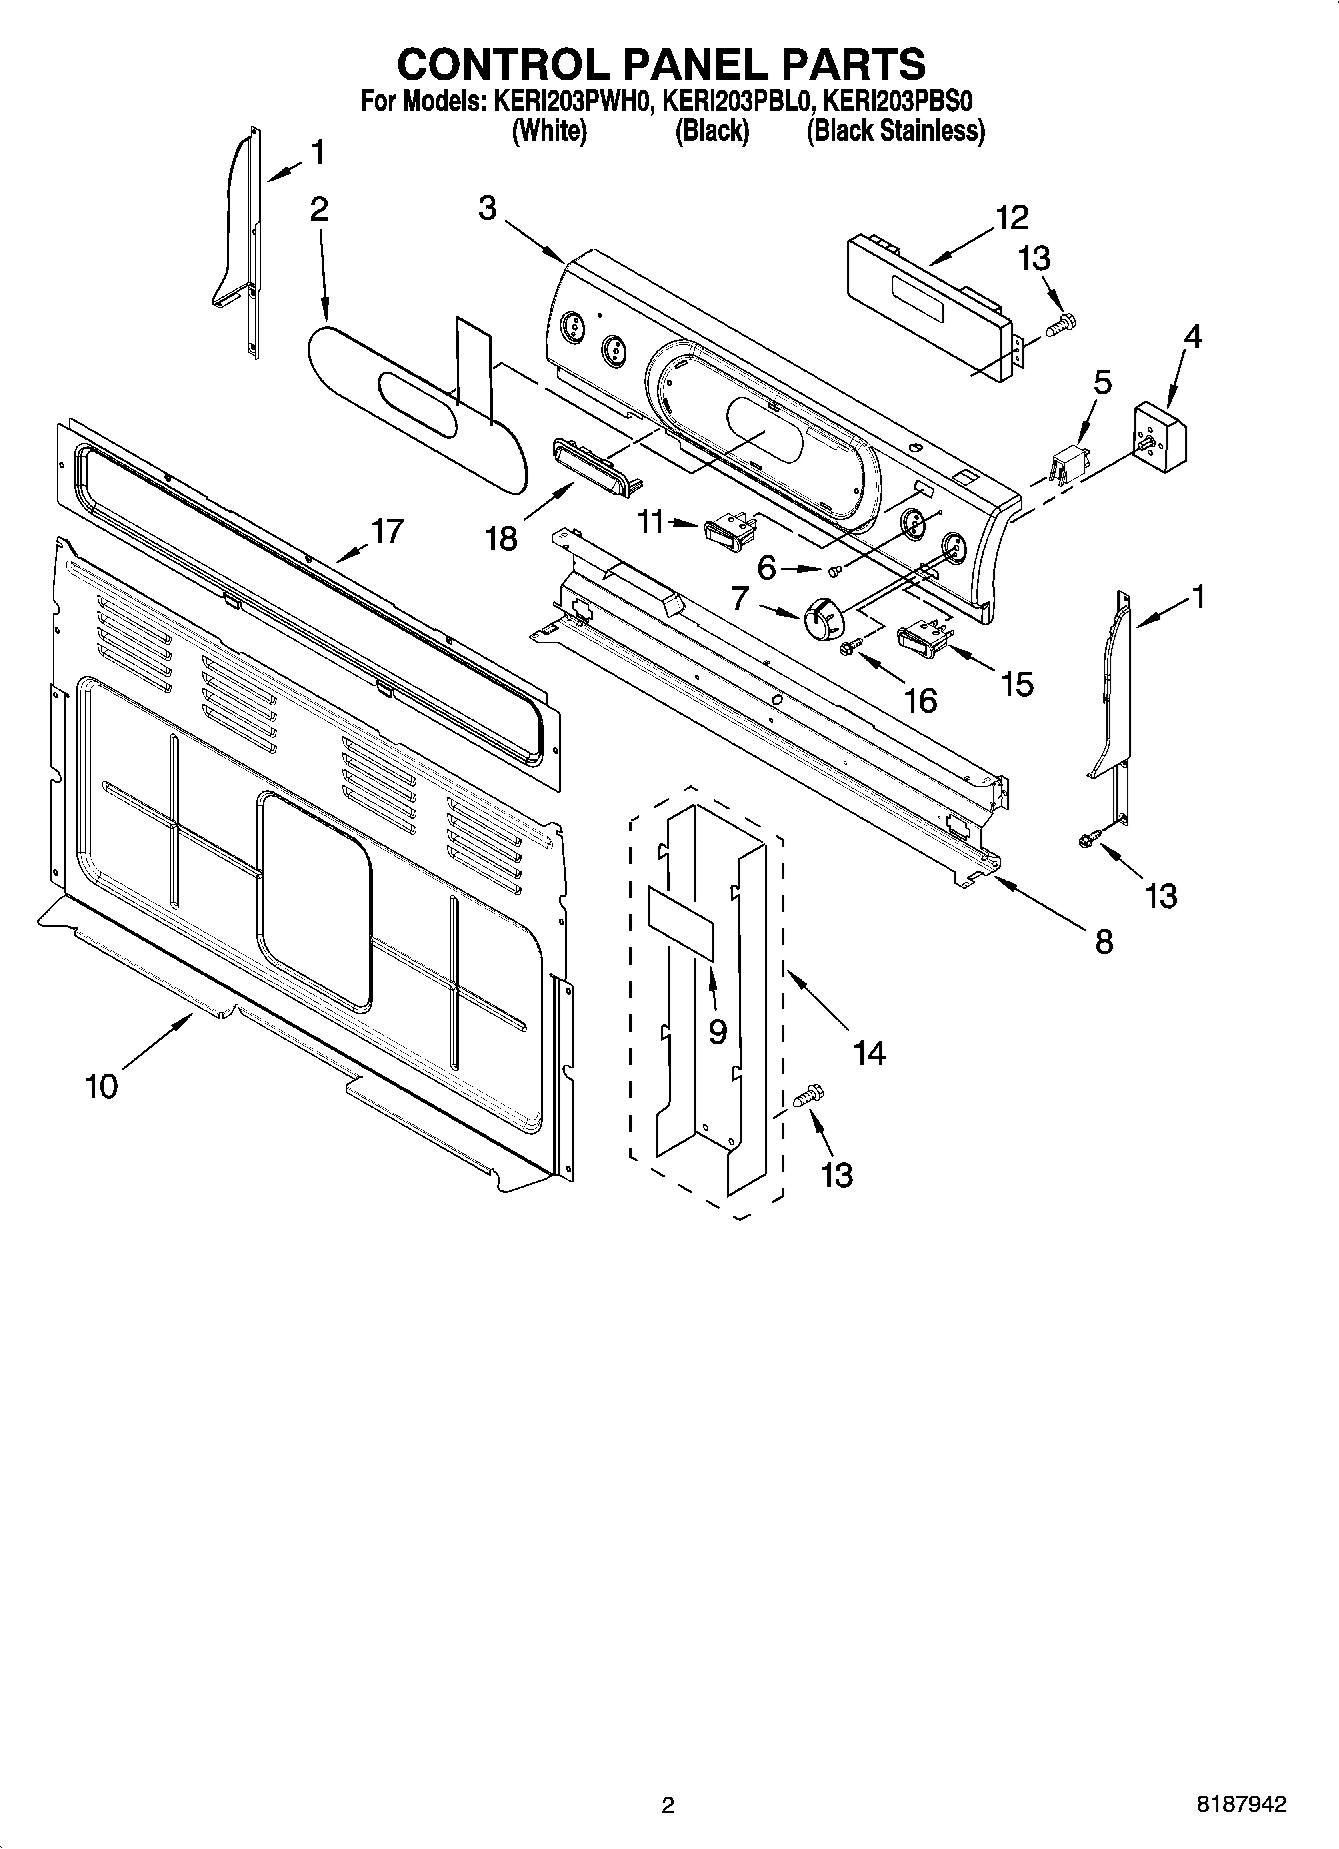 wdf111pabb 4 wiring harness pabb  u2022 mifinder co